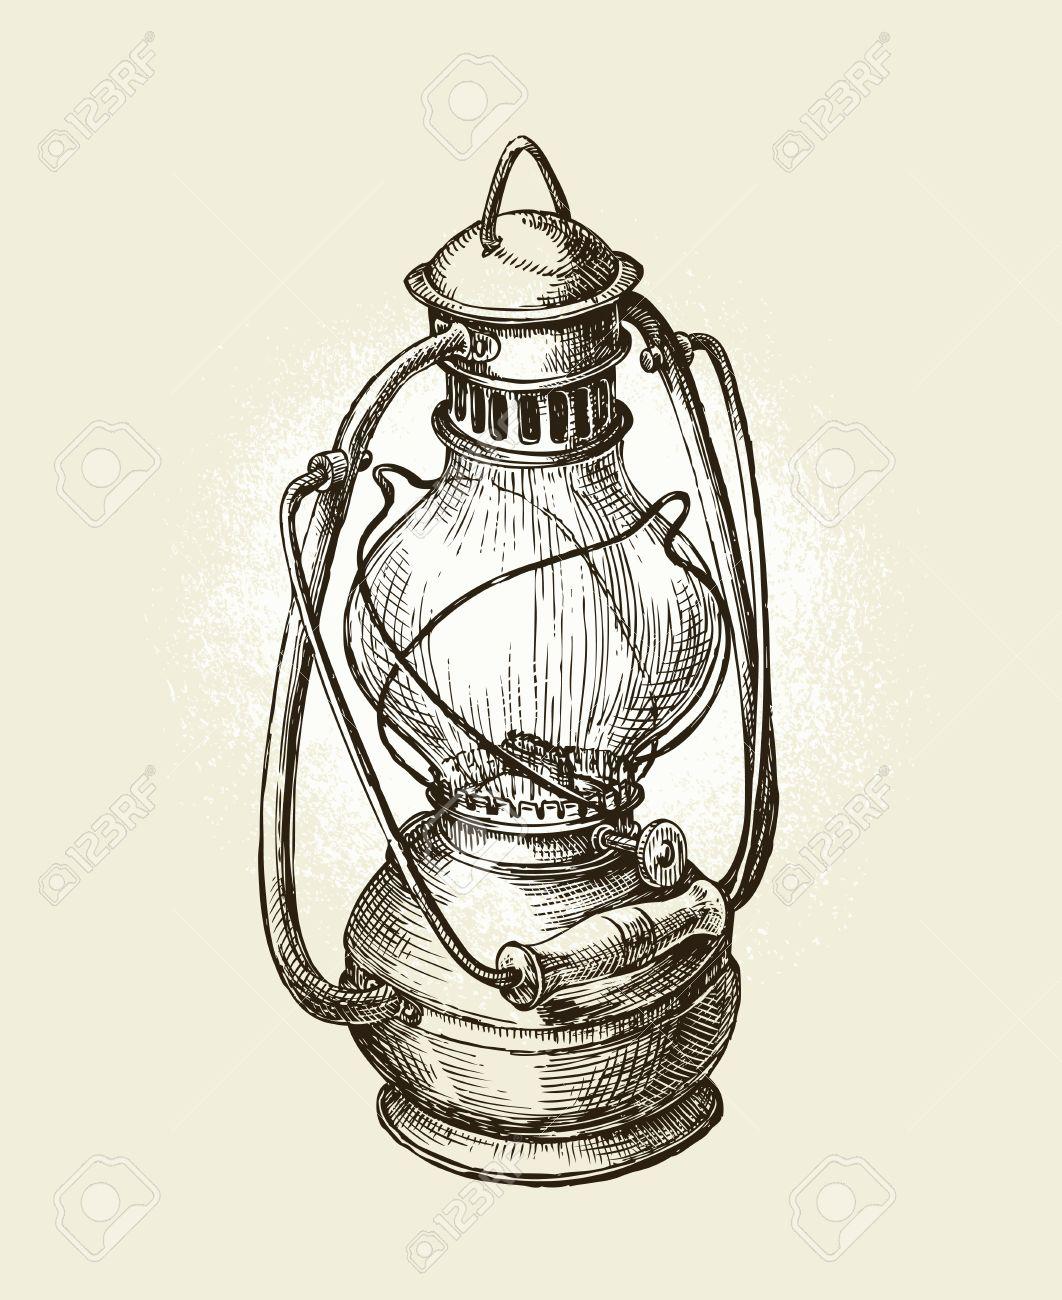 Hand Drawn Vintage Kerosene Lamp. Sketch Oil Lamp. Vector ... for Oil Lamp Drawing  45jwn